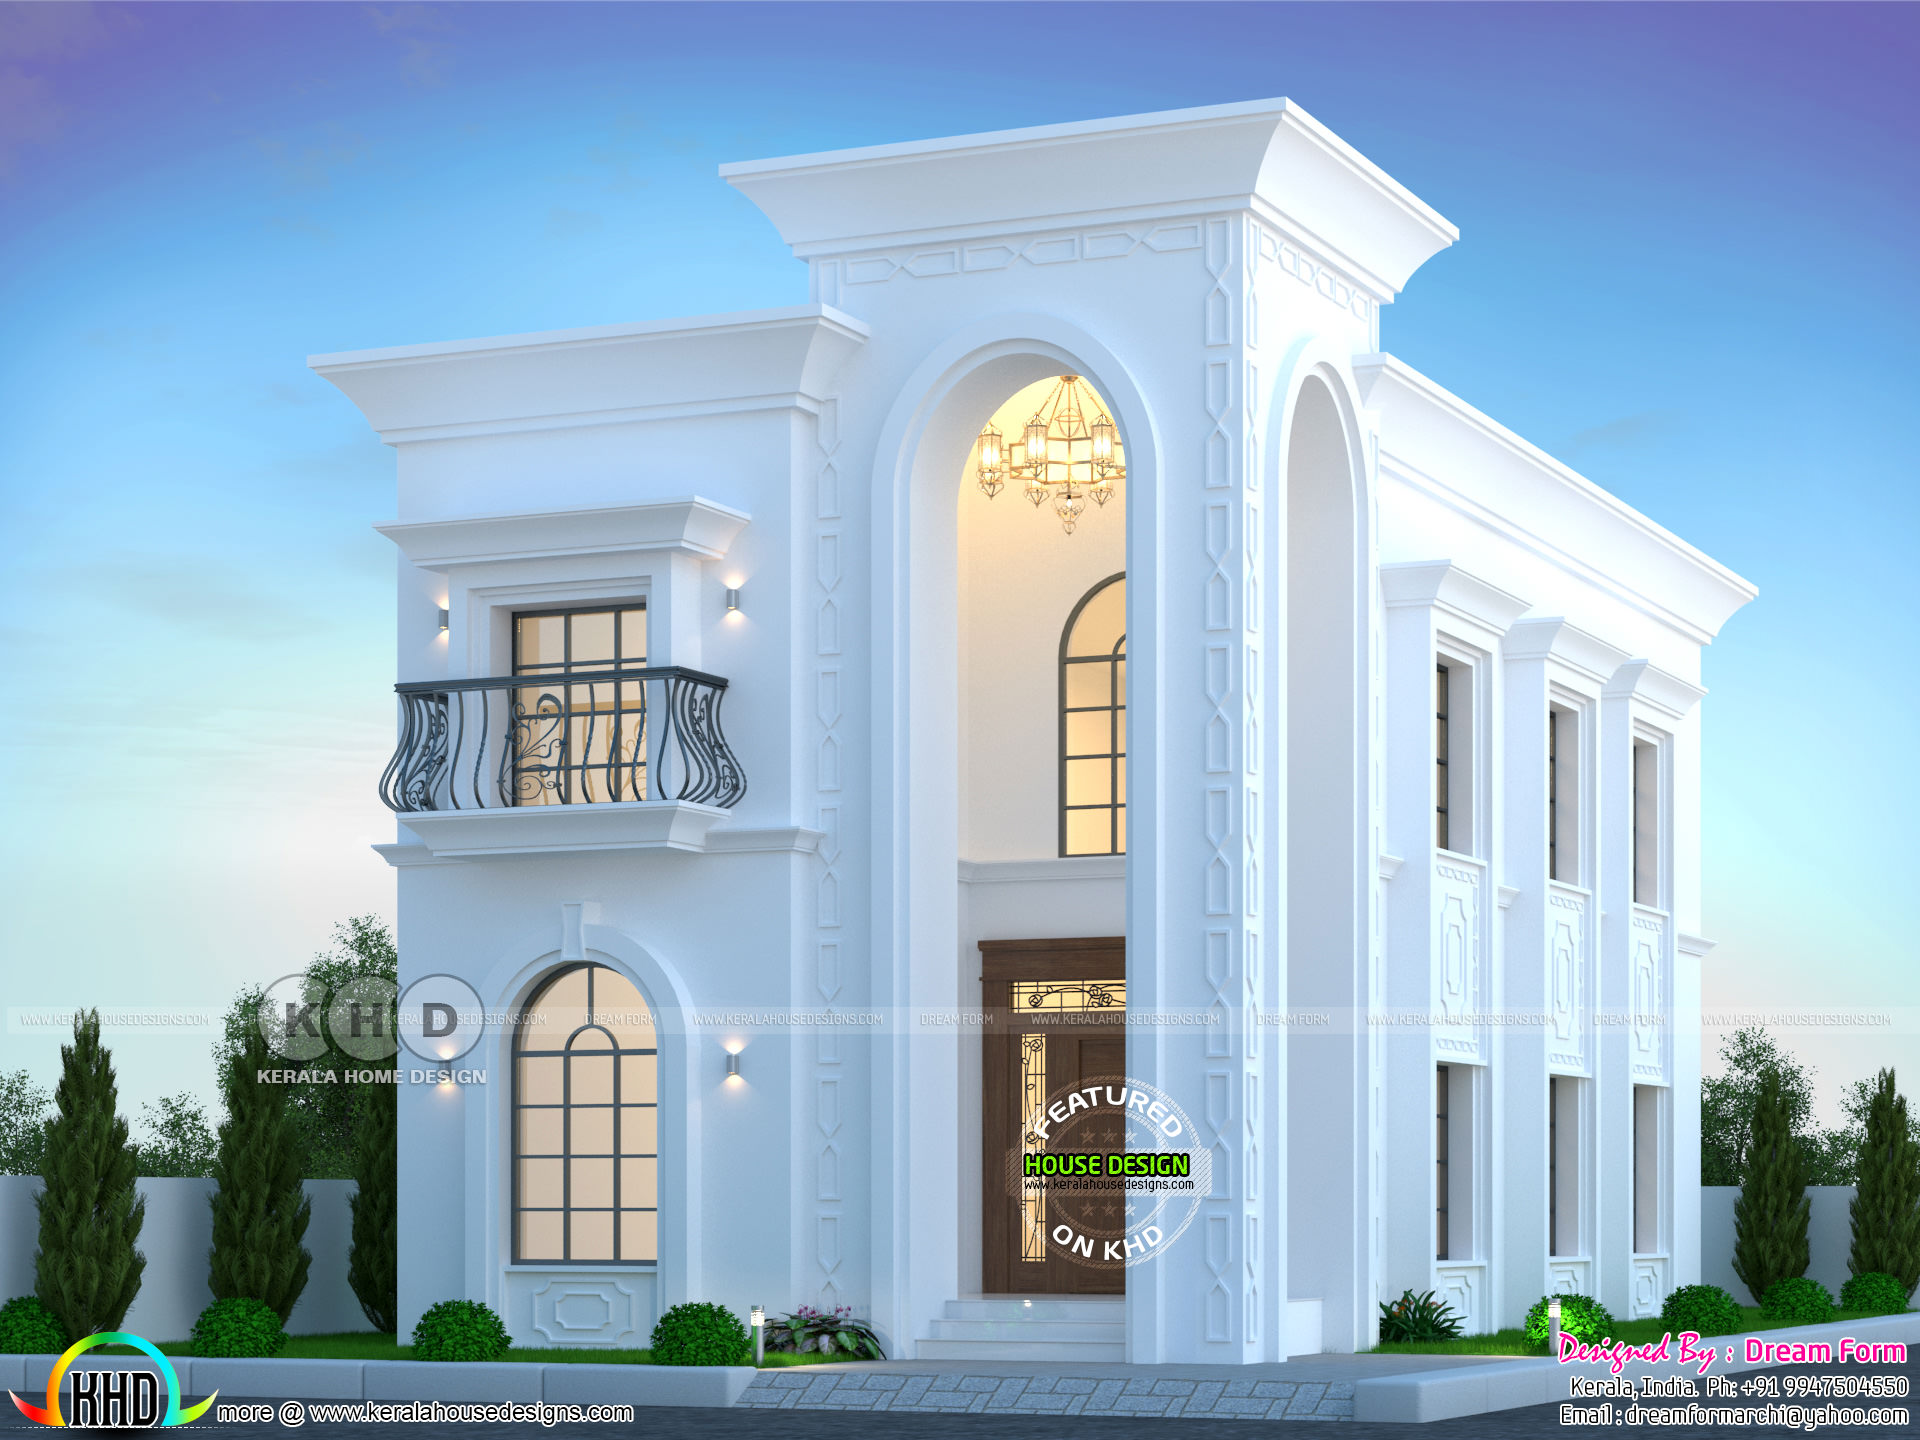 4 Bedrooms 2400 Sq Ft Arabic Villa Model Home Design Kerala Home Design And Floor Plans 8000 Houses